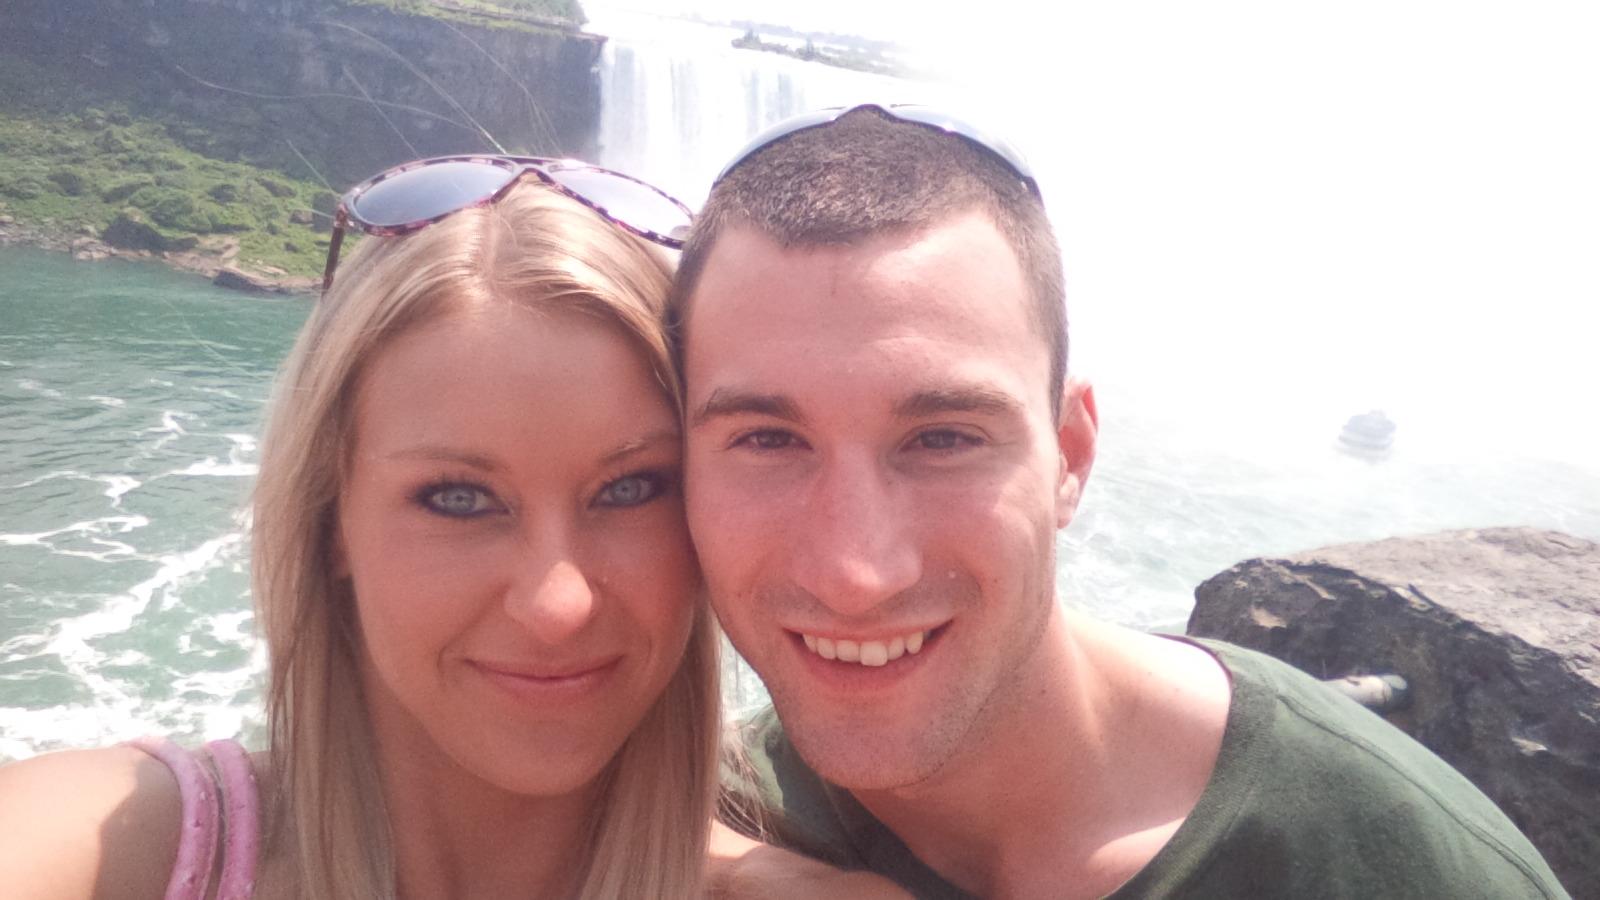 Niagara Falls - Engagement weekend!